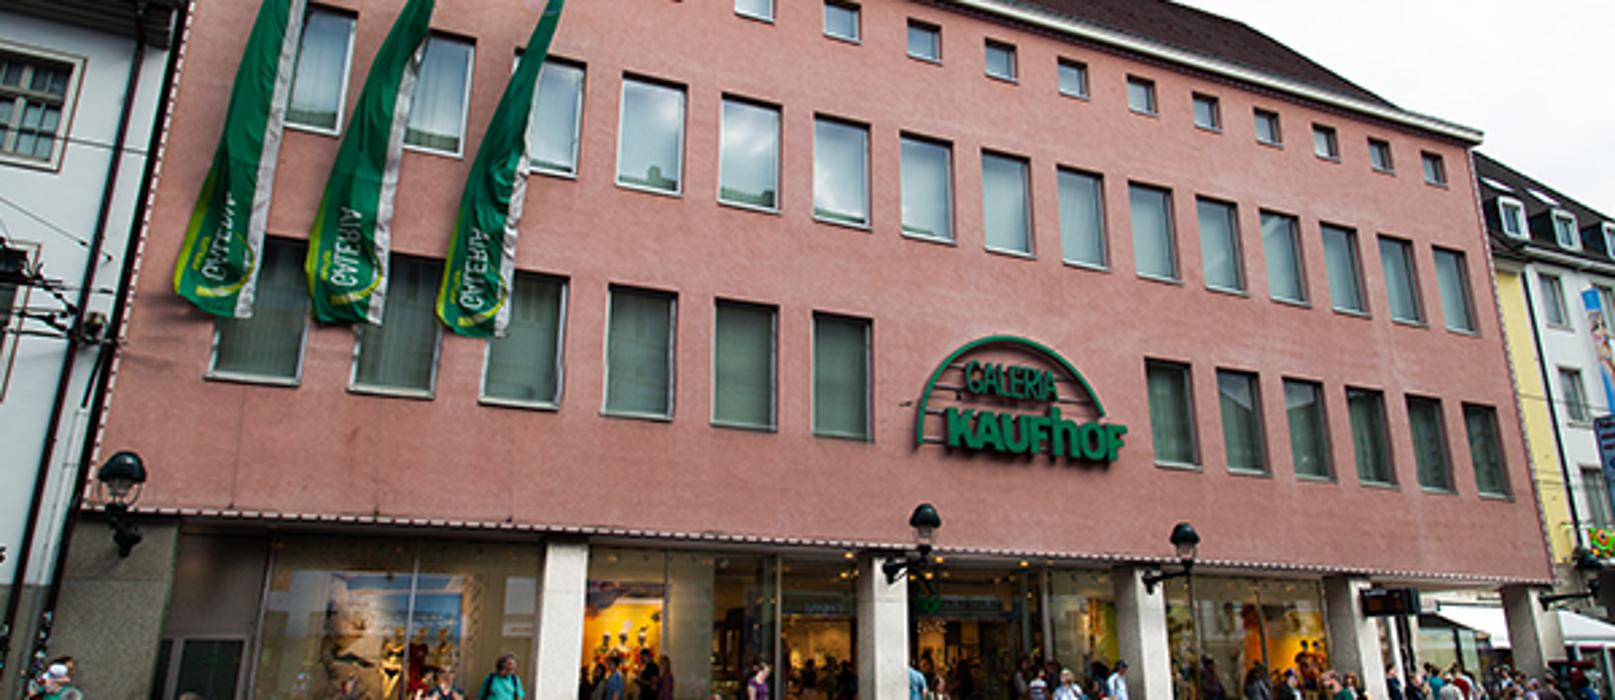 GALERIA (Kaufhof) Freiburg Kaiser-Joseph-Straße, Kaiser-Joseph-Straße in Freiburg